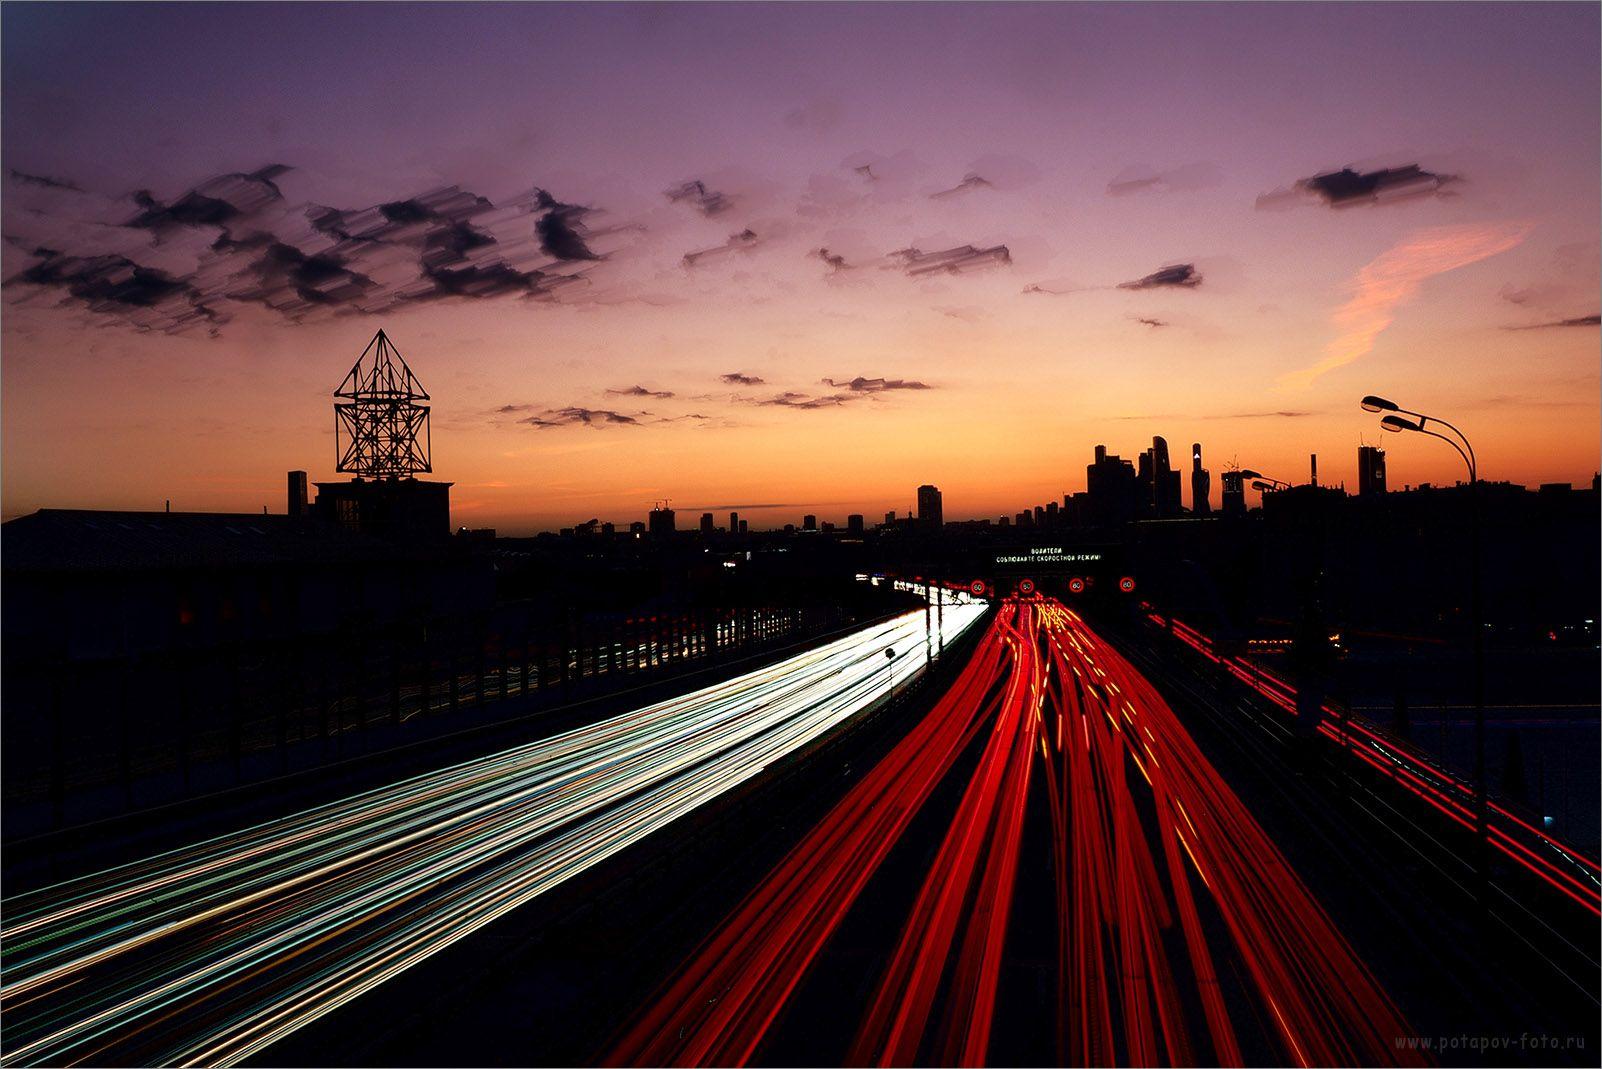 МЦК - Андреевский мост мцк мост фризлайт закат